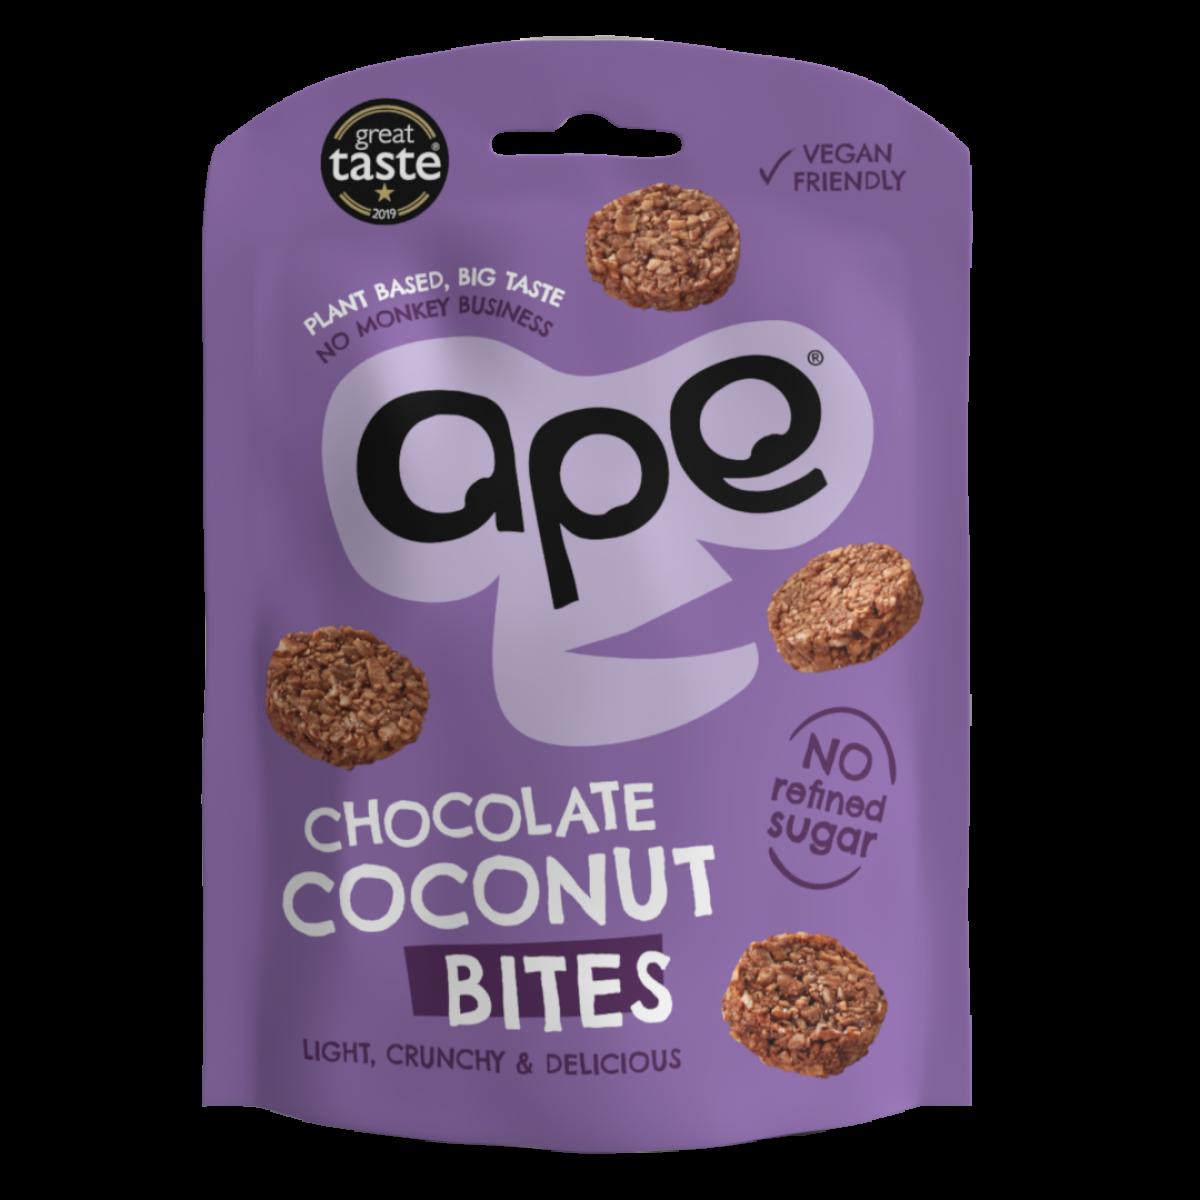 Chocolate Coconut Bites